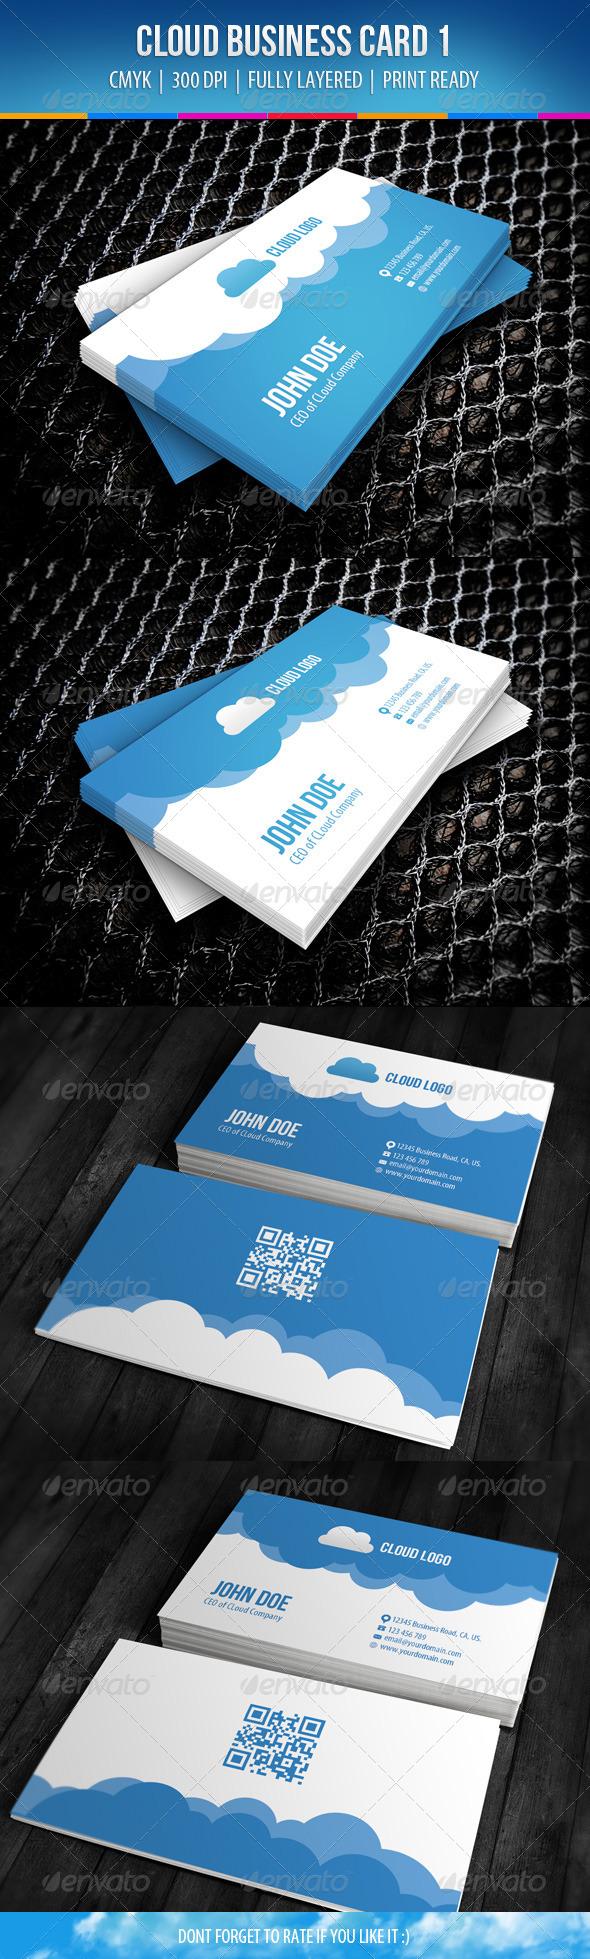 Cloud Business Card Design 1 - Creative Business Cards